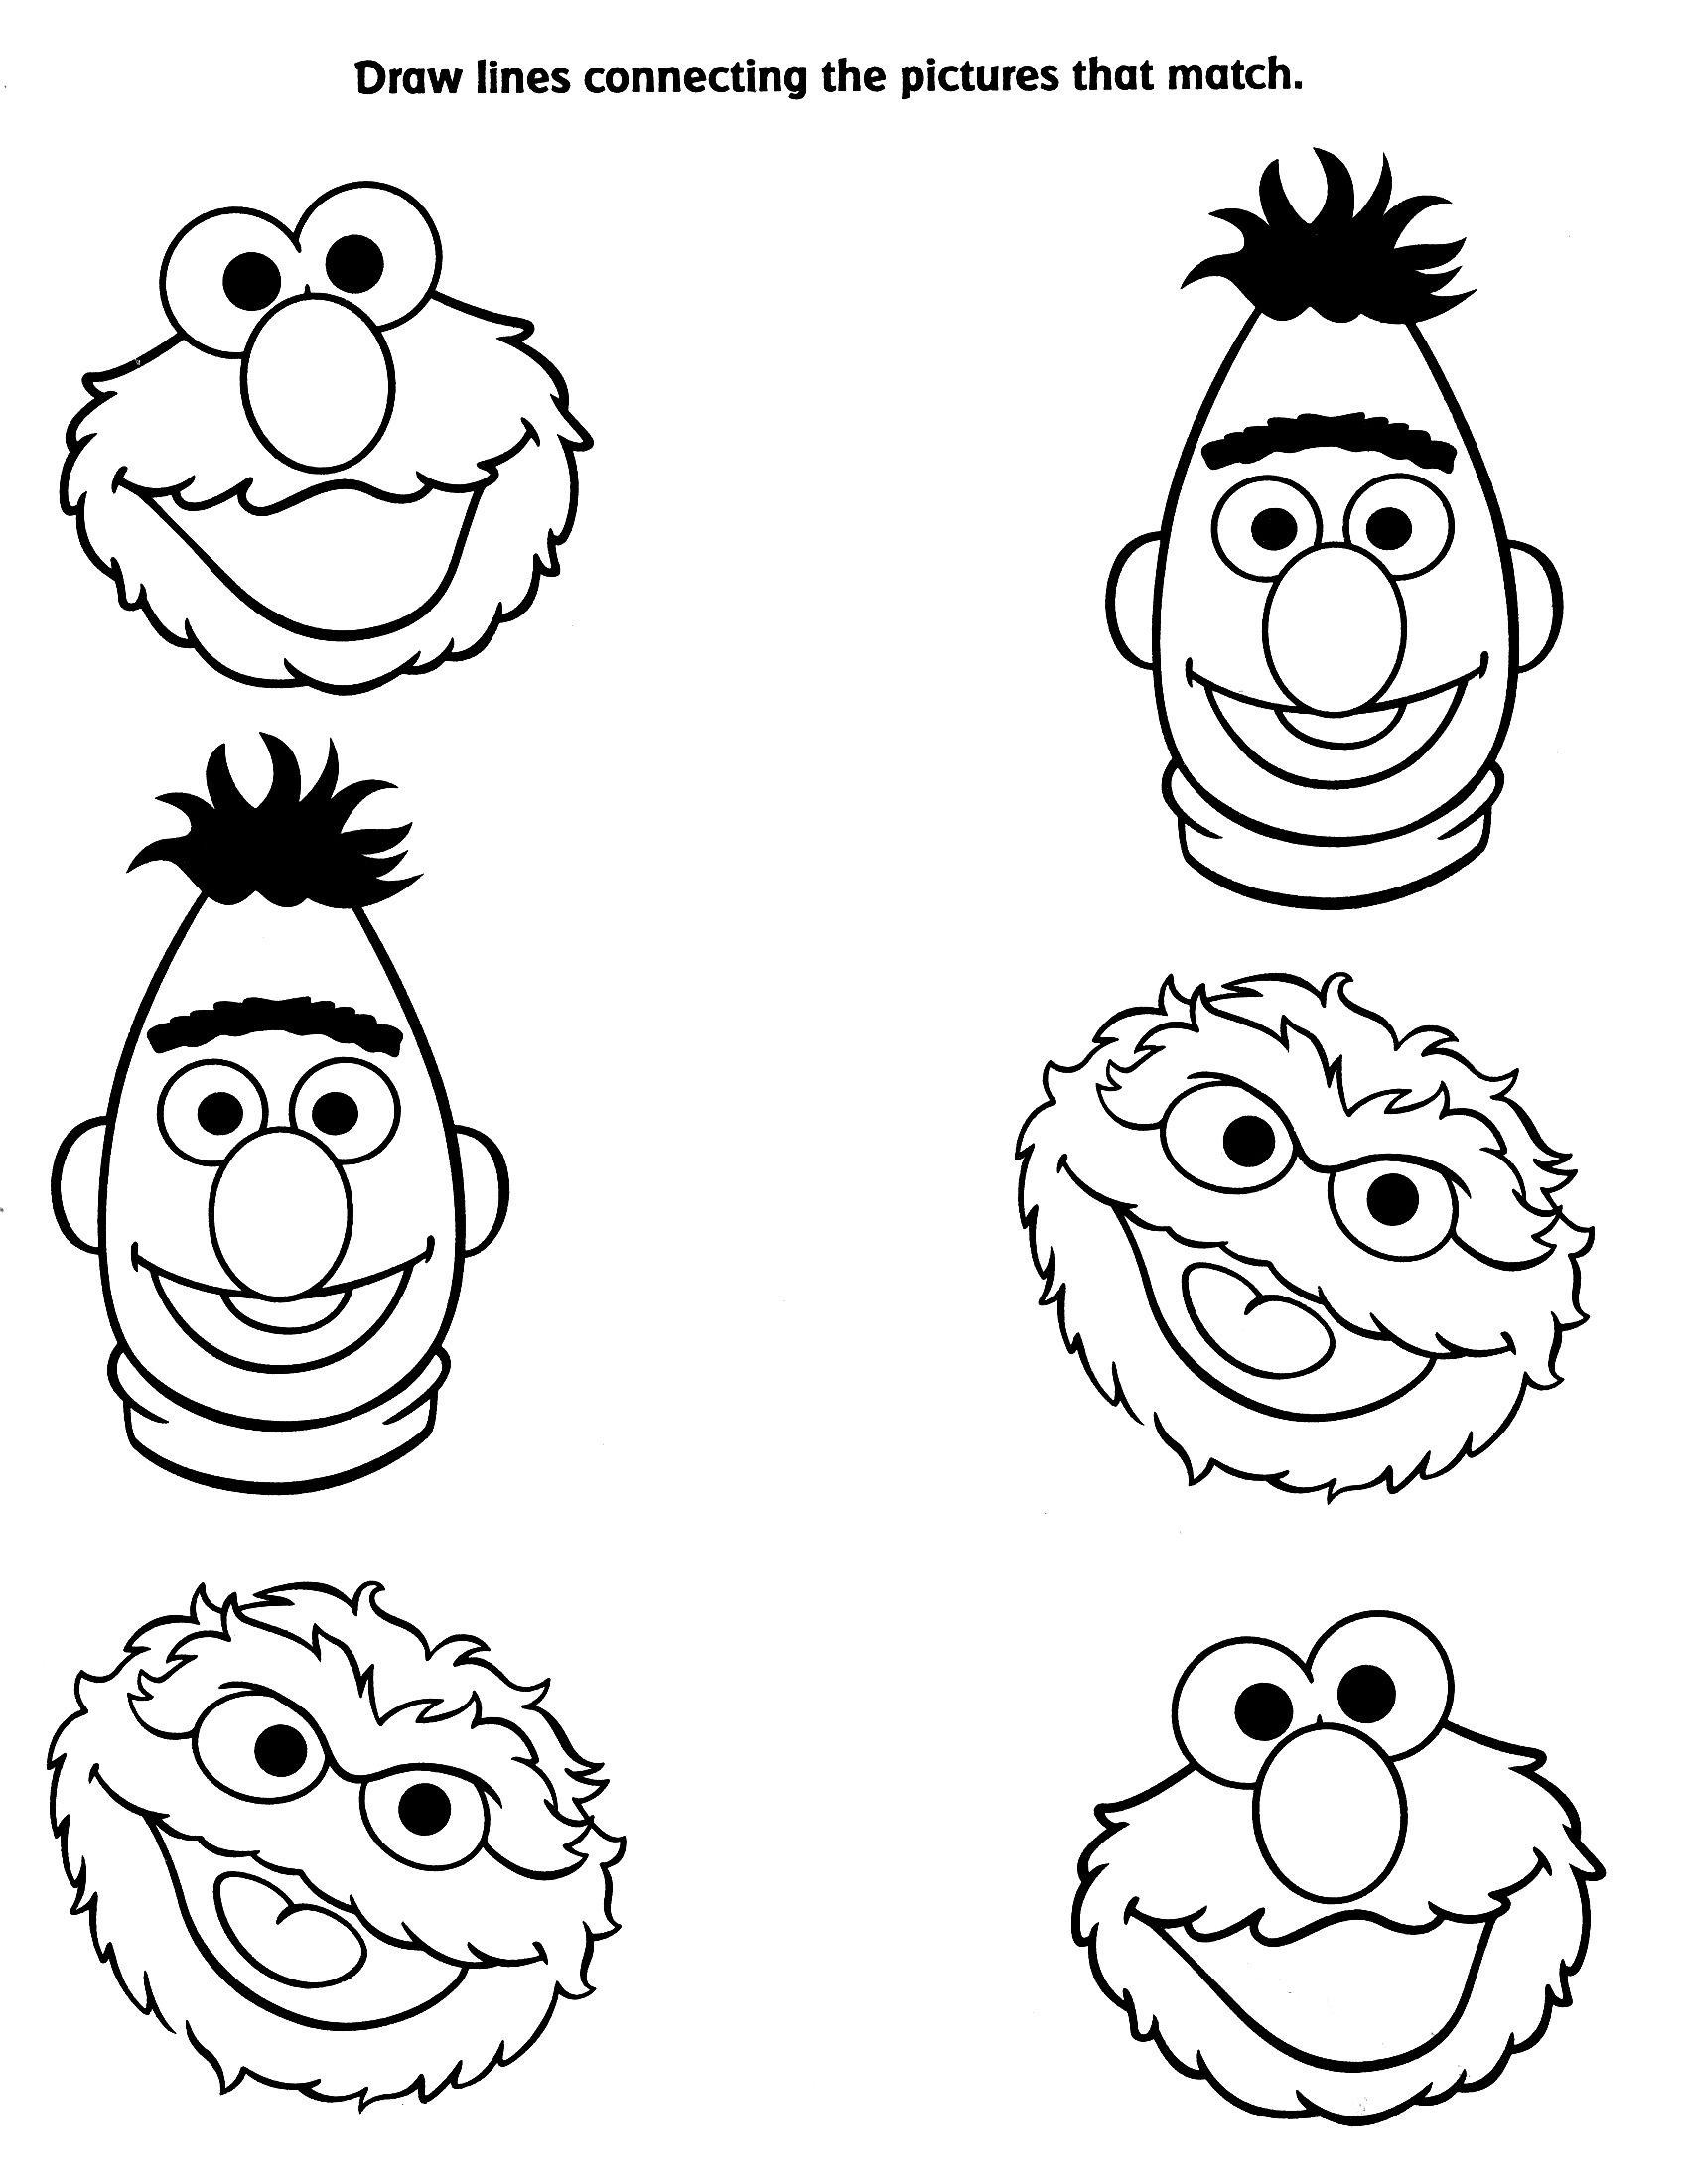 Pin By Julie Inskeep On Kindergeburtstag Sesame Street Coloring Pages Sesame Street Crafts Sesame Street